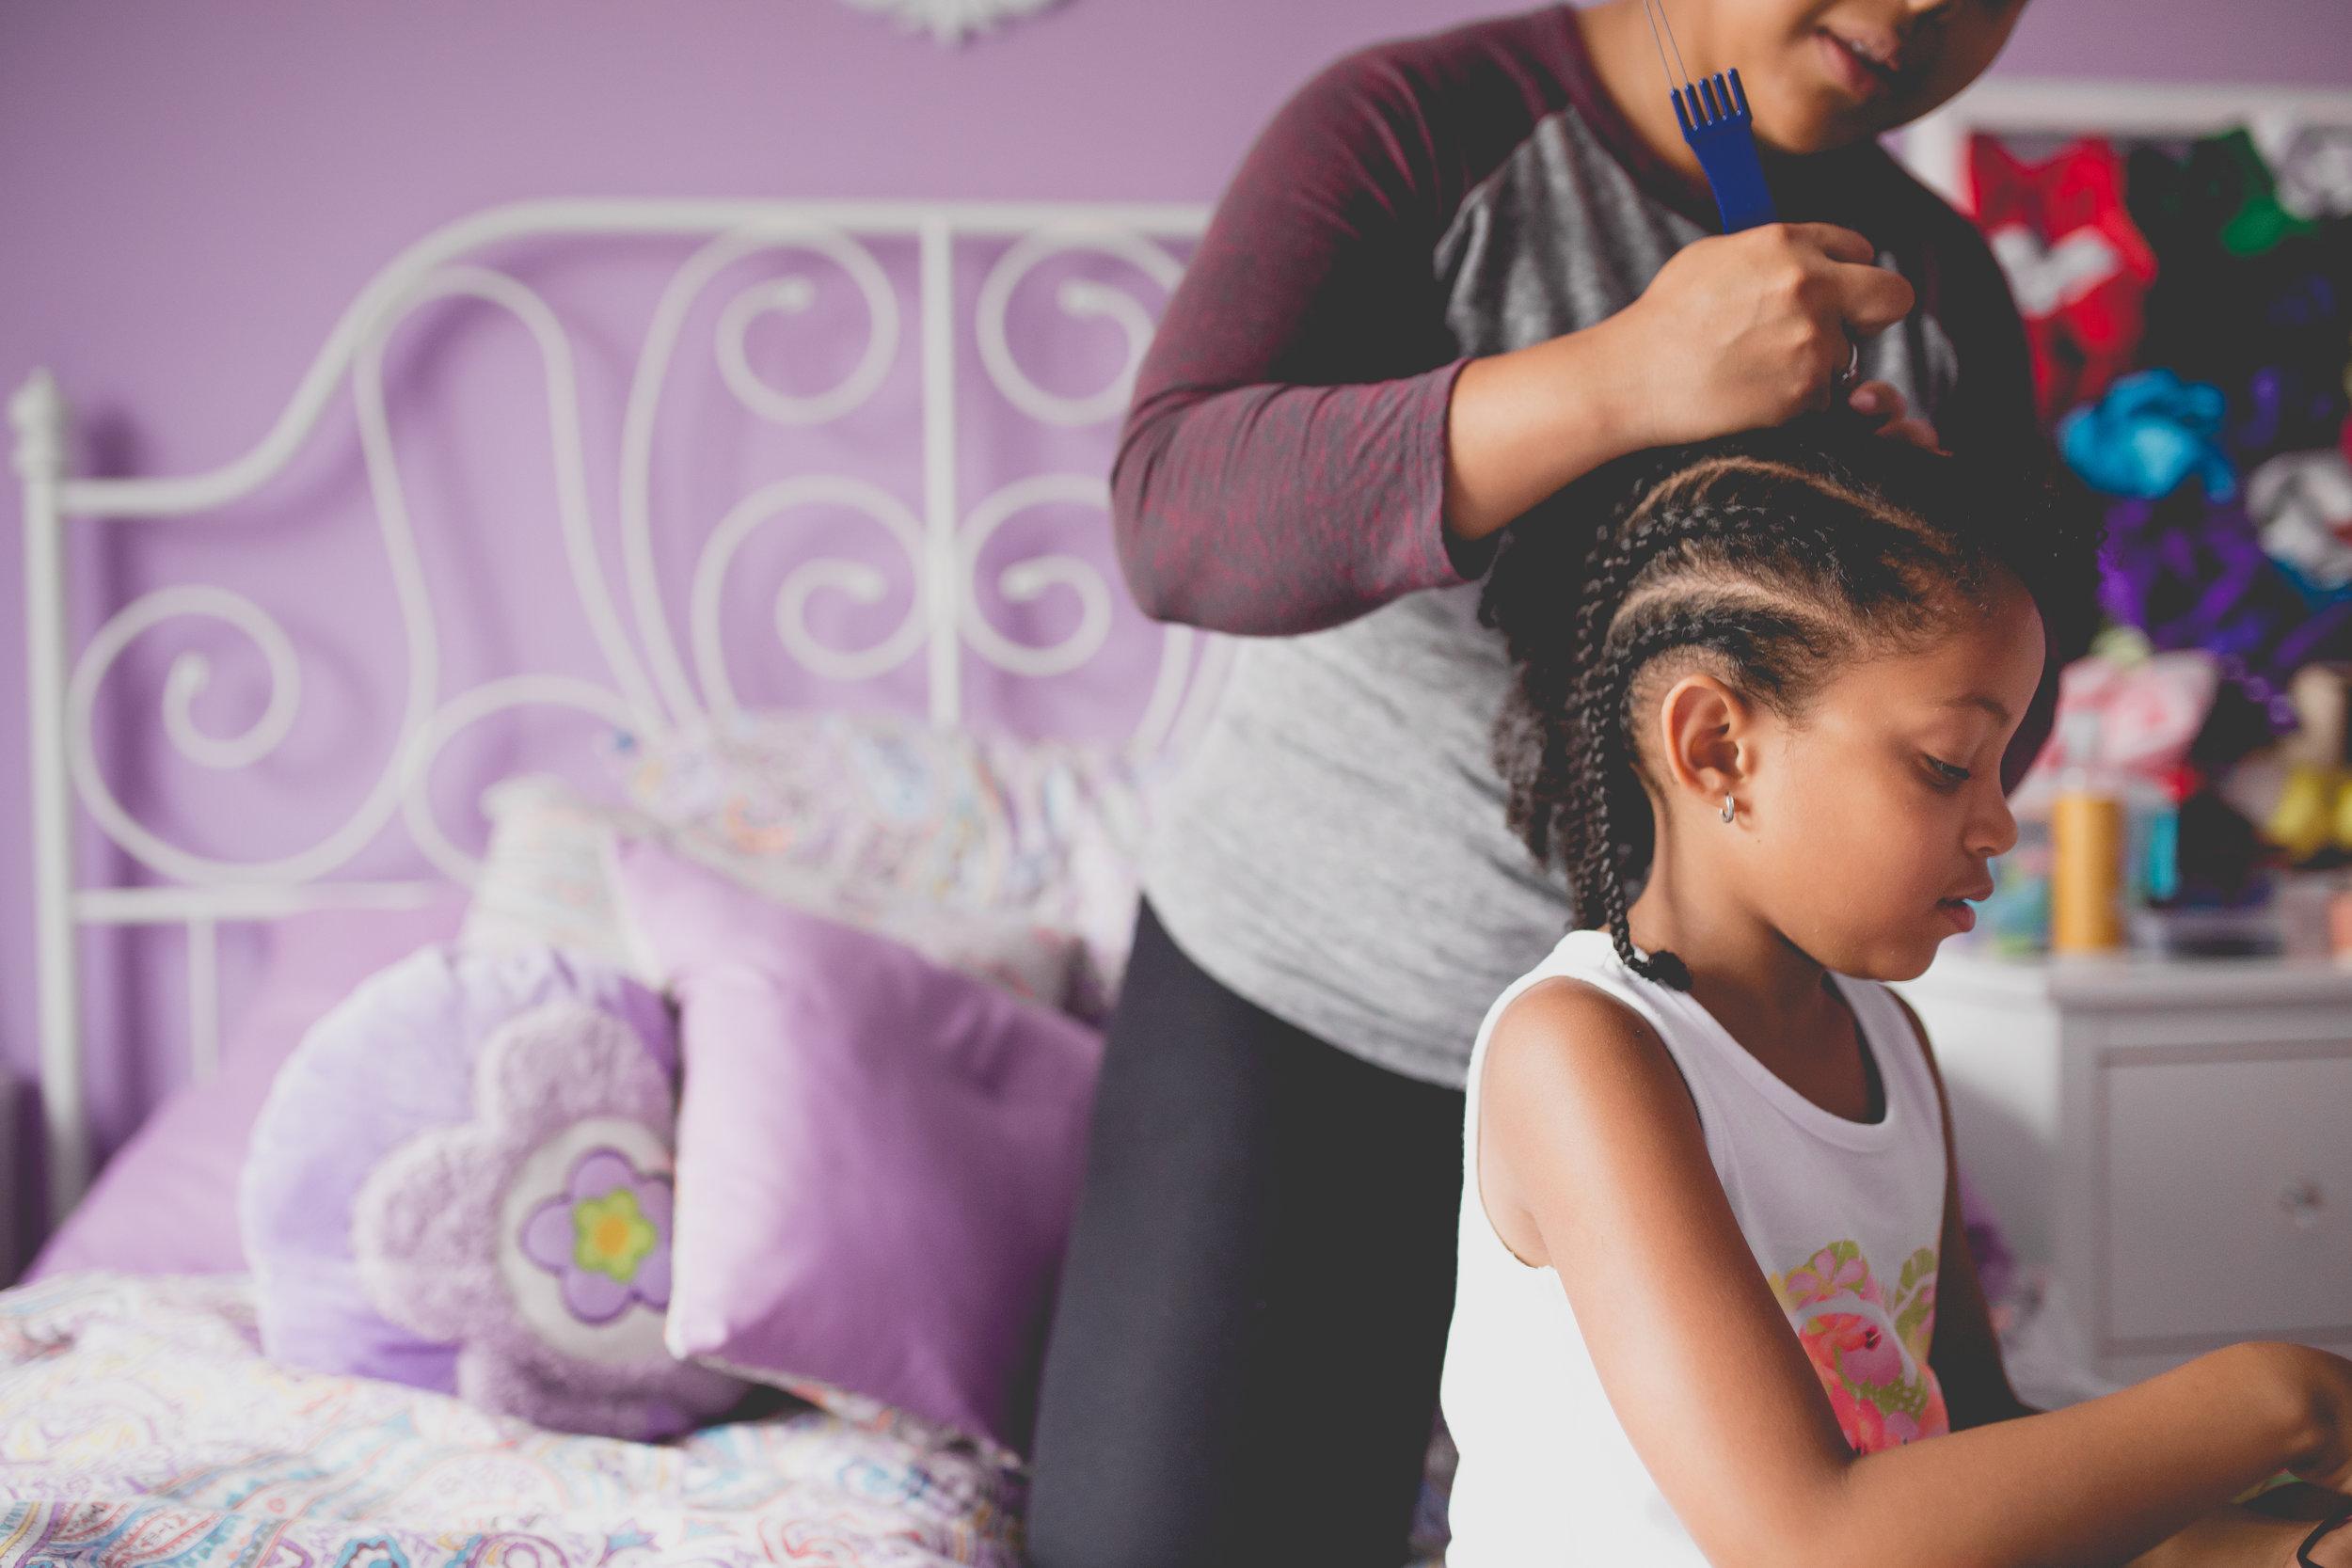 Mom puts cornrows in daughter's hair